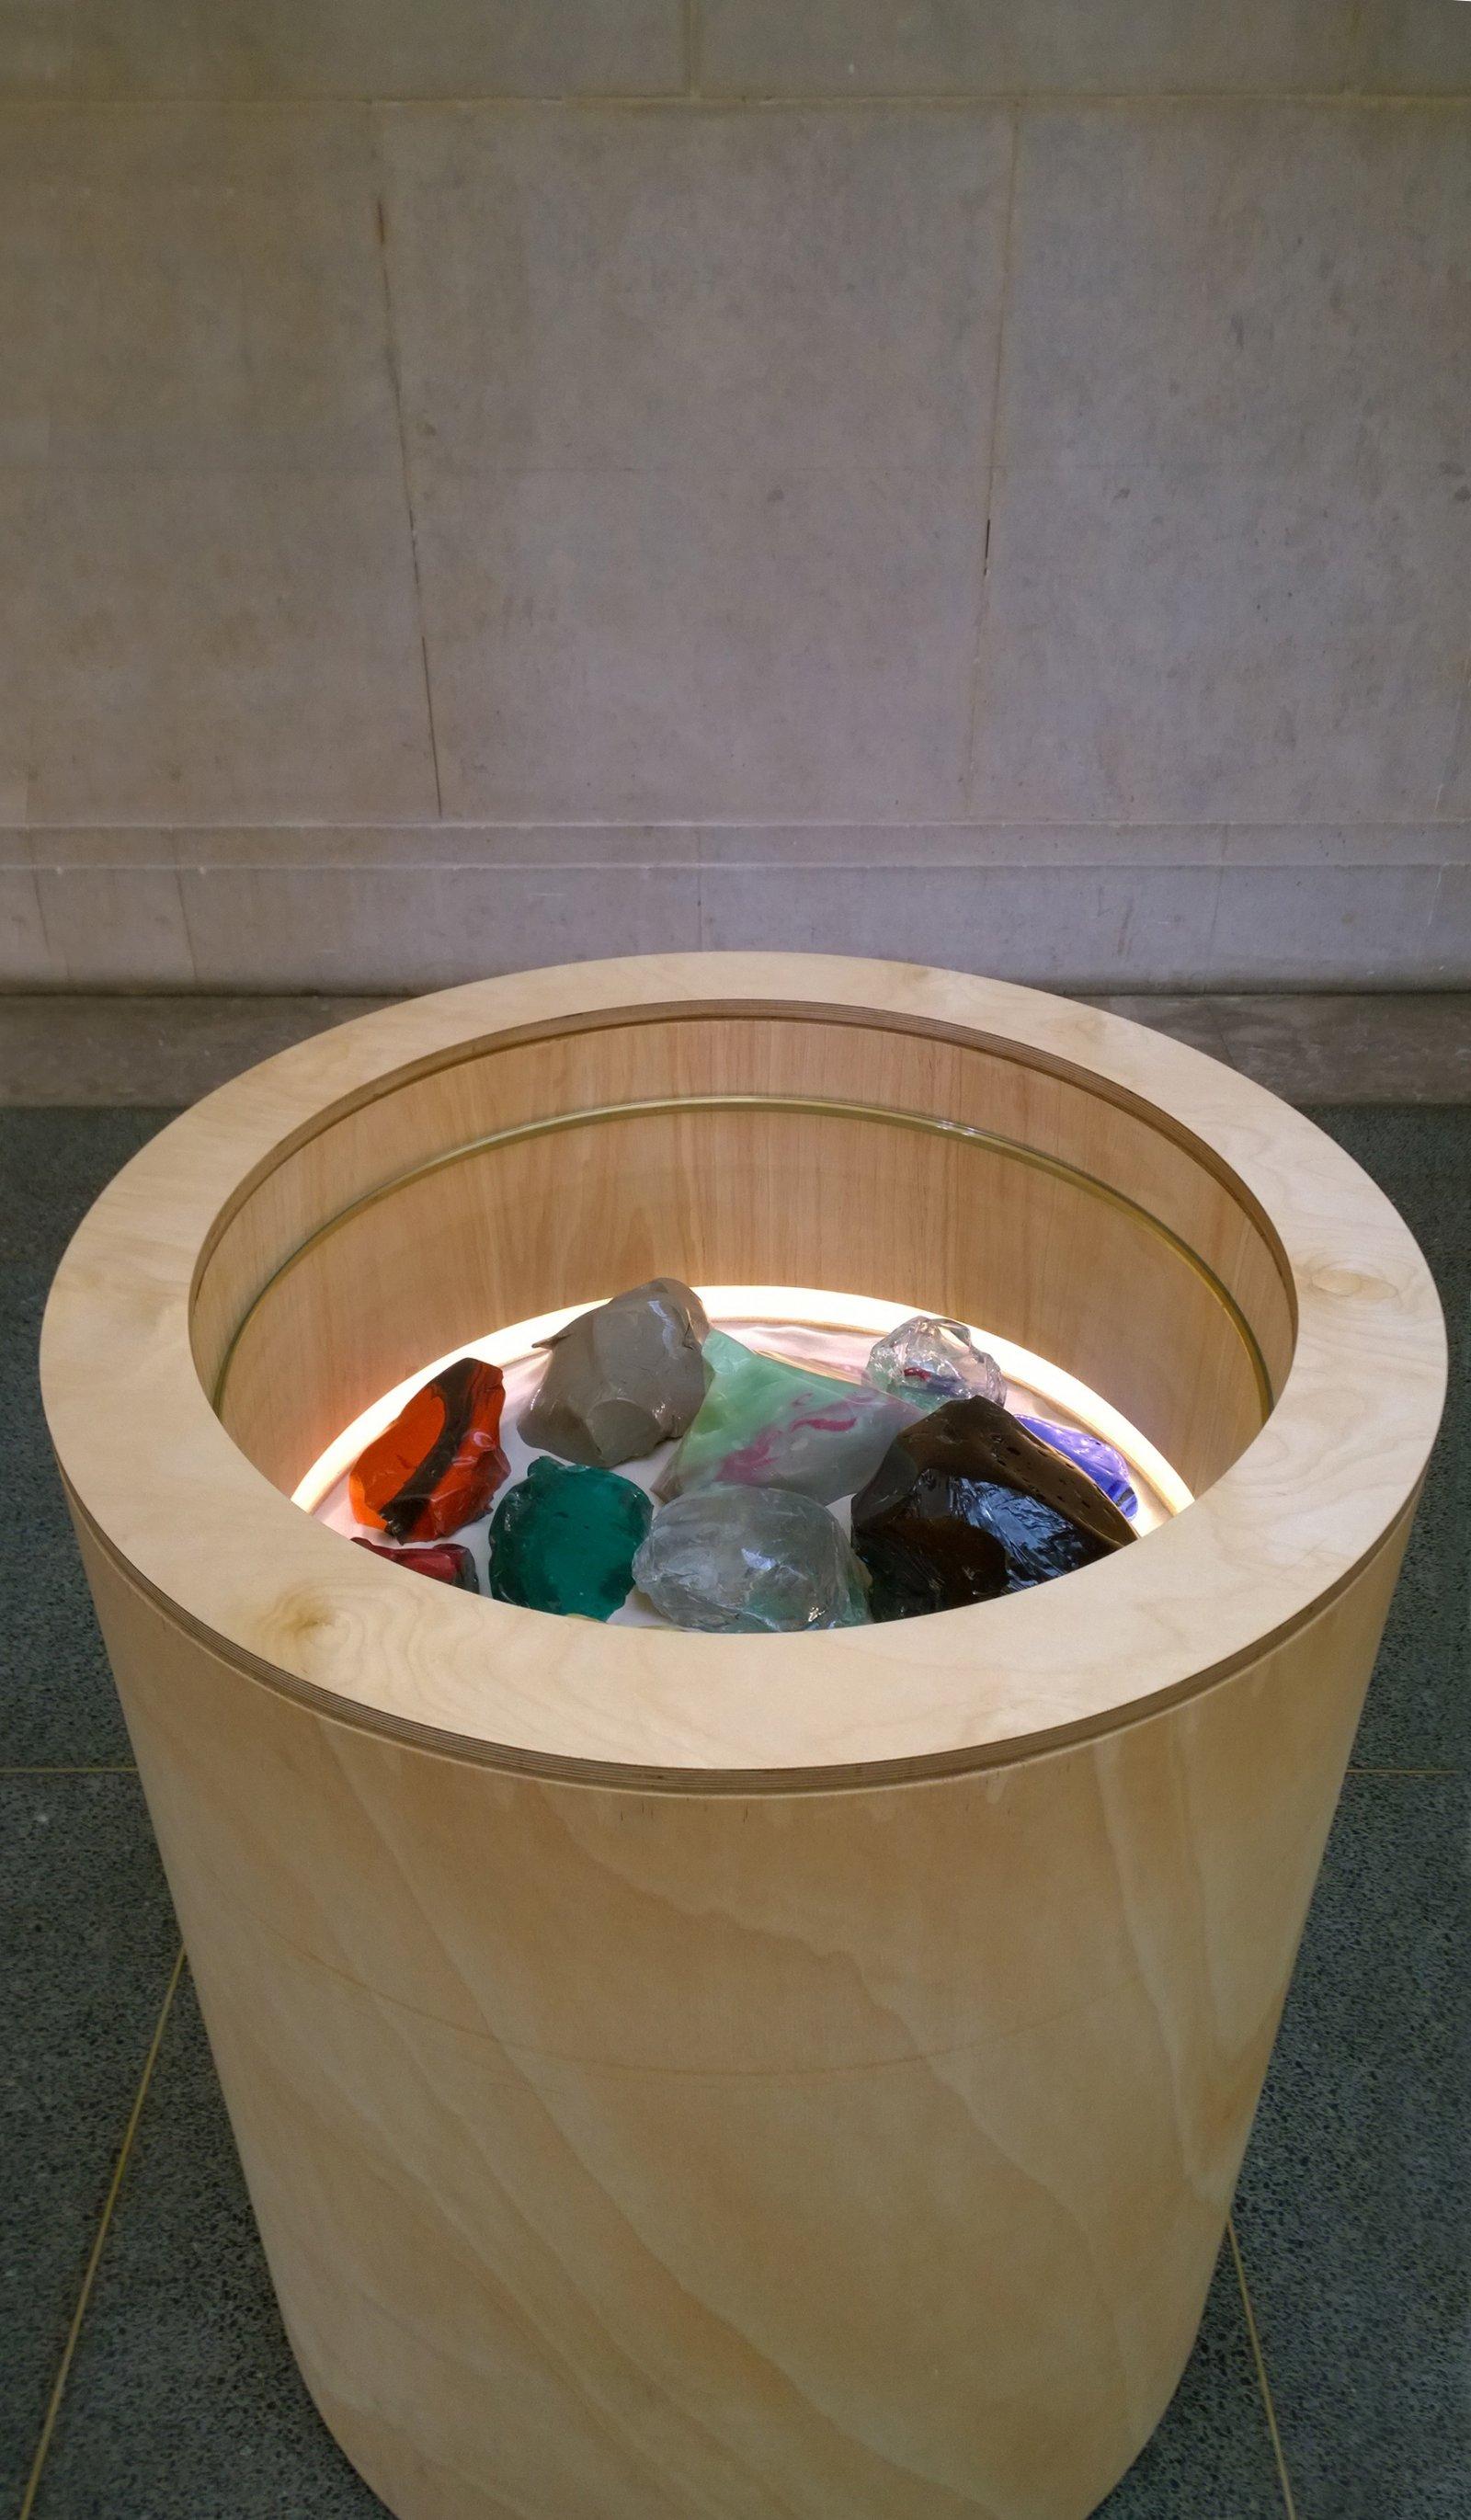 Christina Mackie, Cullet bin, 2015, wood, sand, glass, amiran, brass, batteries, led lights, lock, 46 x 38 x 38 in. (118 x 97 x 97 cm) by Christina Mackie